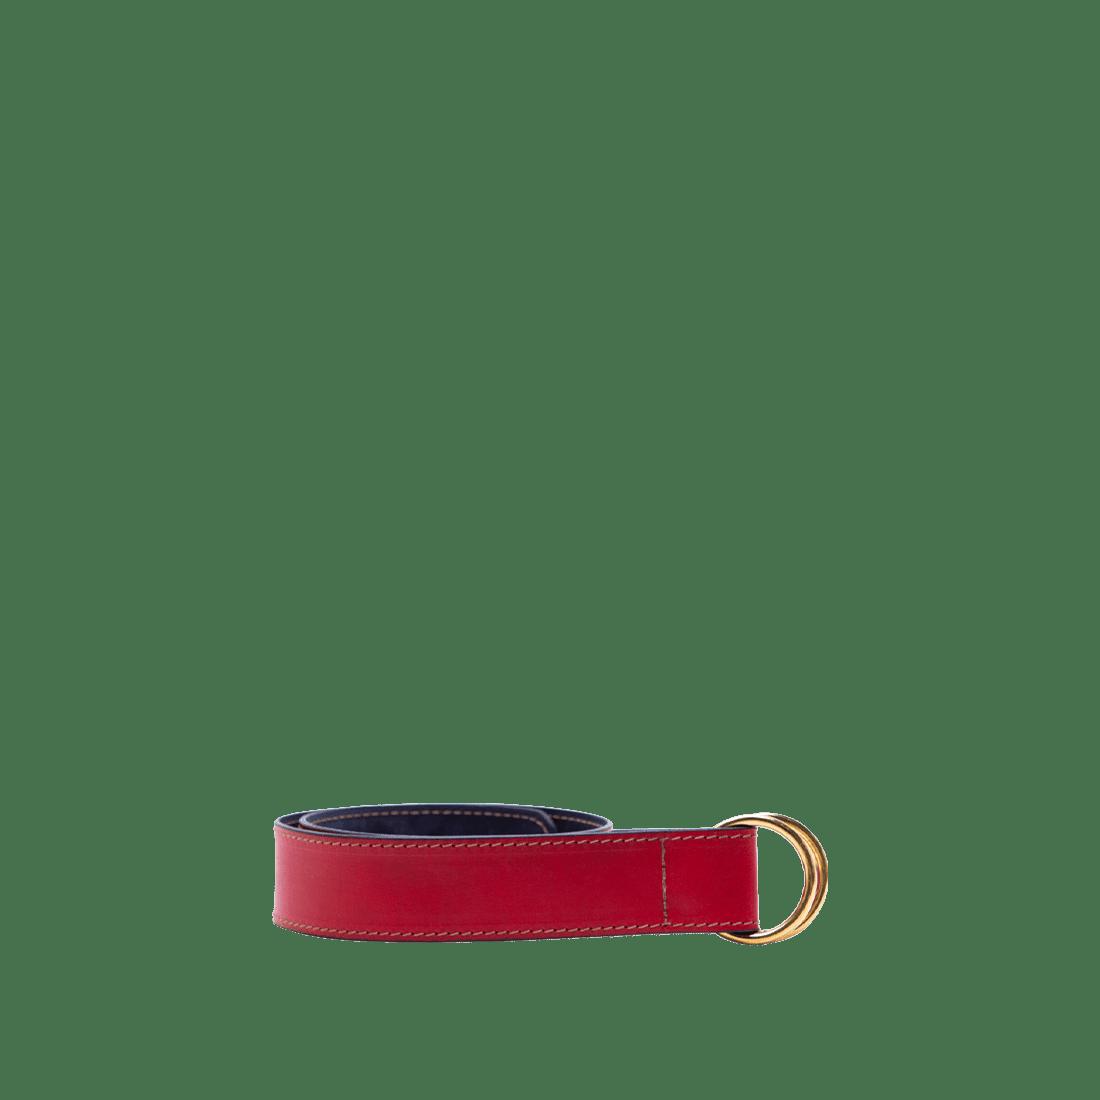 The Loop Belt matt red